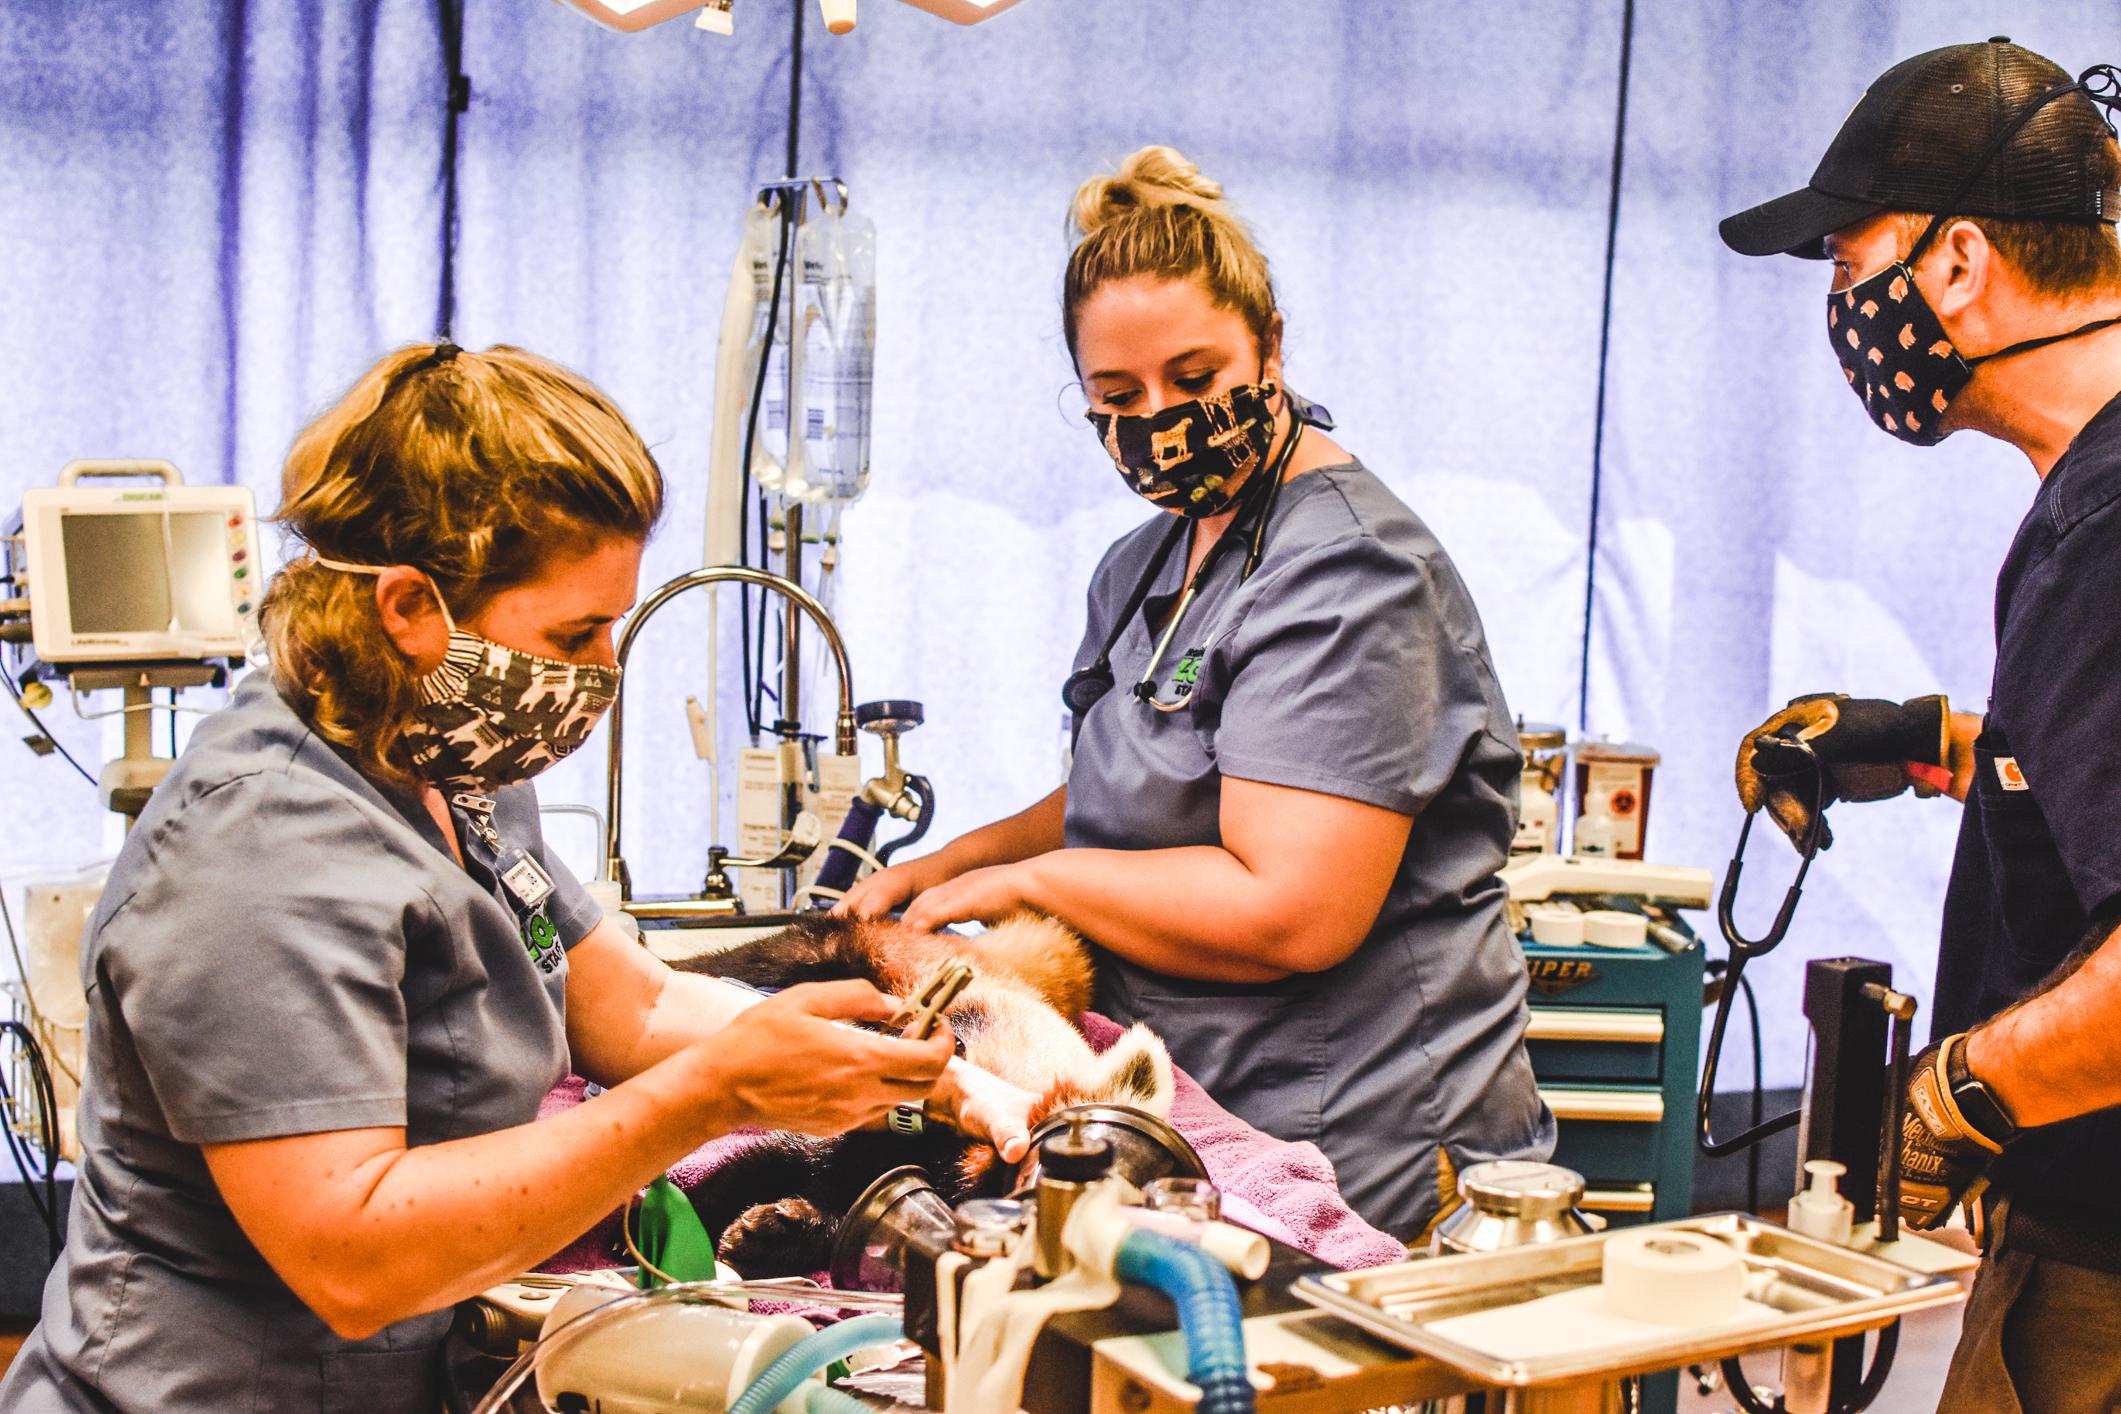 masked vet staff examine anesthetized red panda